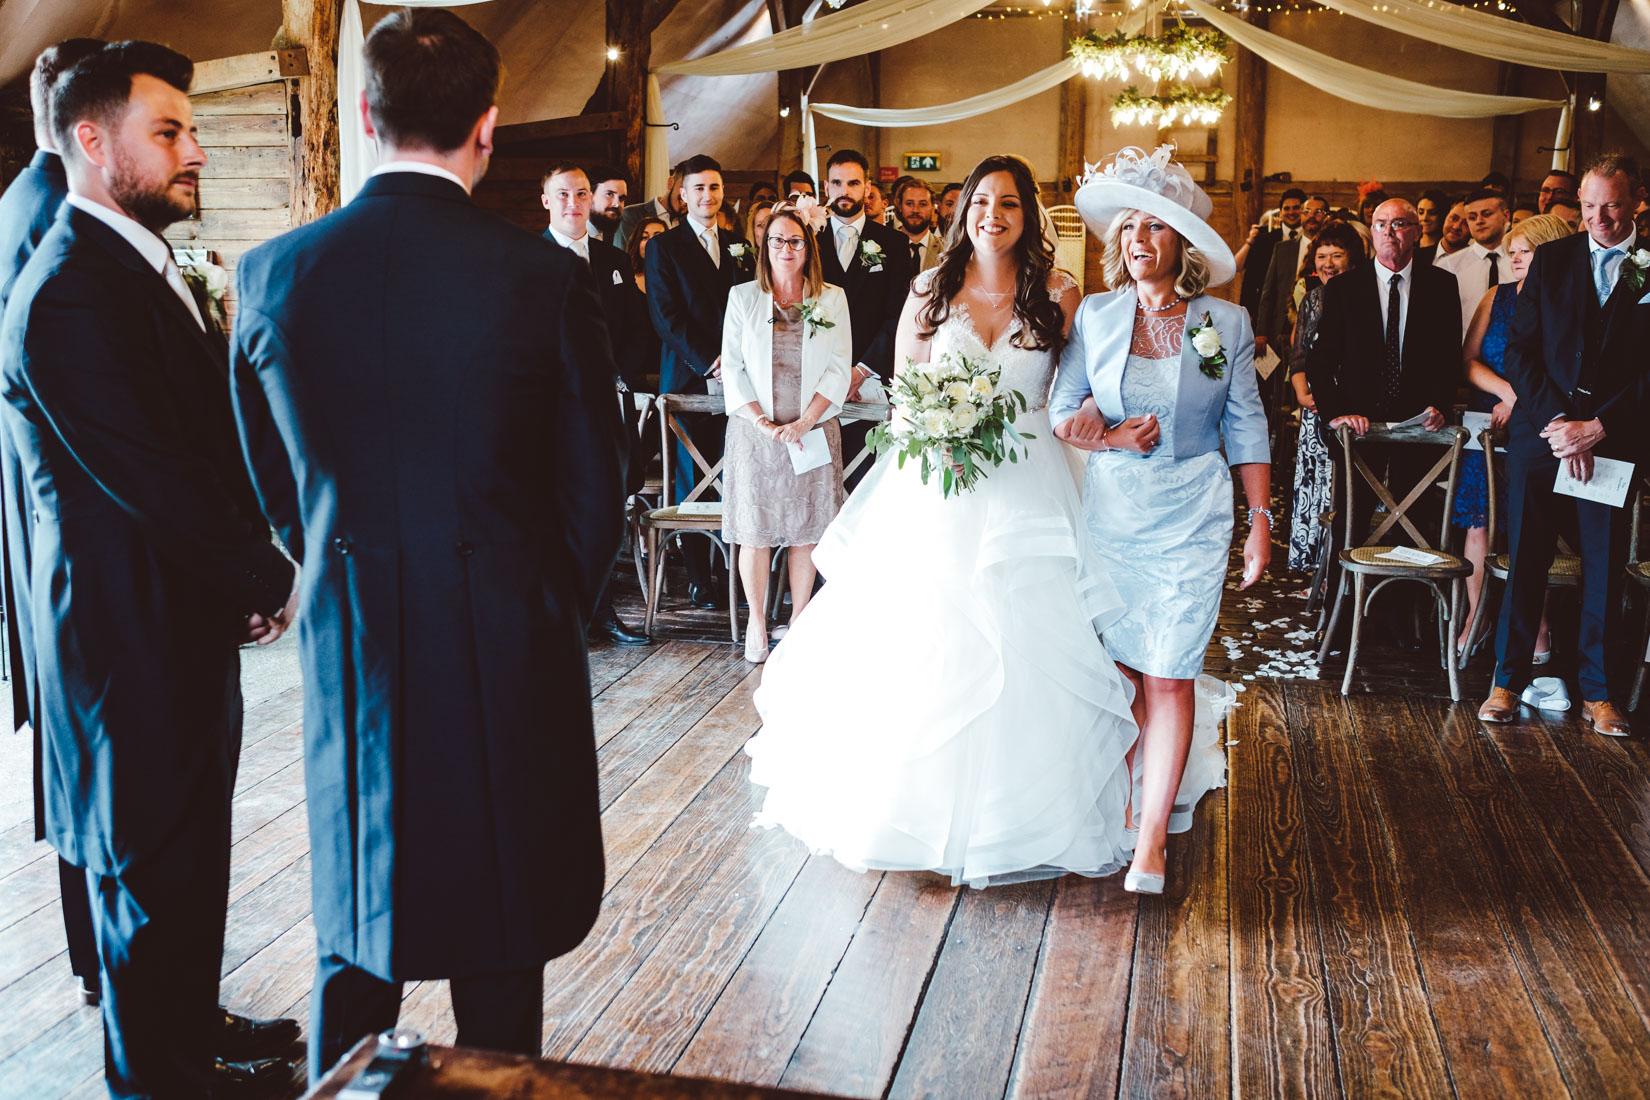 Lains Barn Wedding Photography of the wedding of Jade and Joshua. Documentary style wedding photography by Sam and Steve Photography